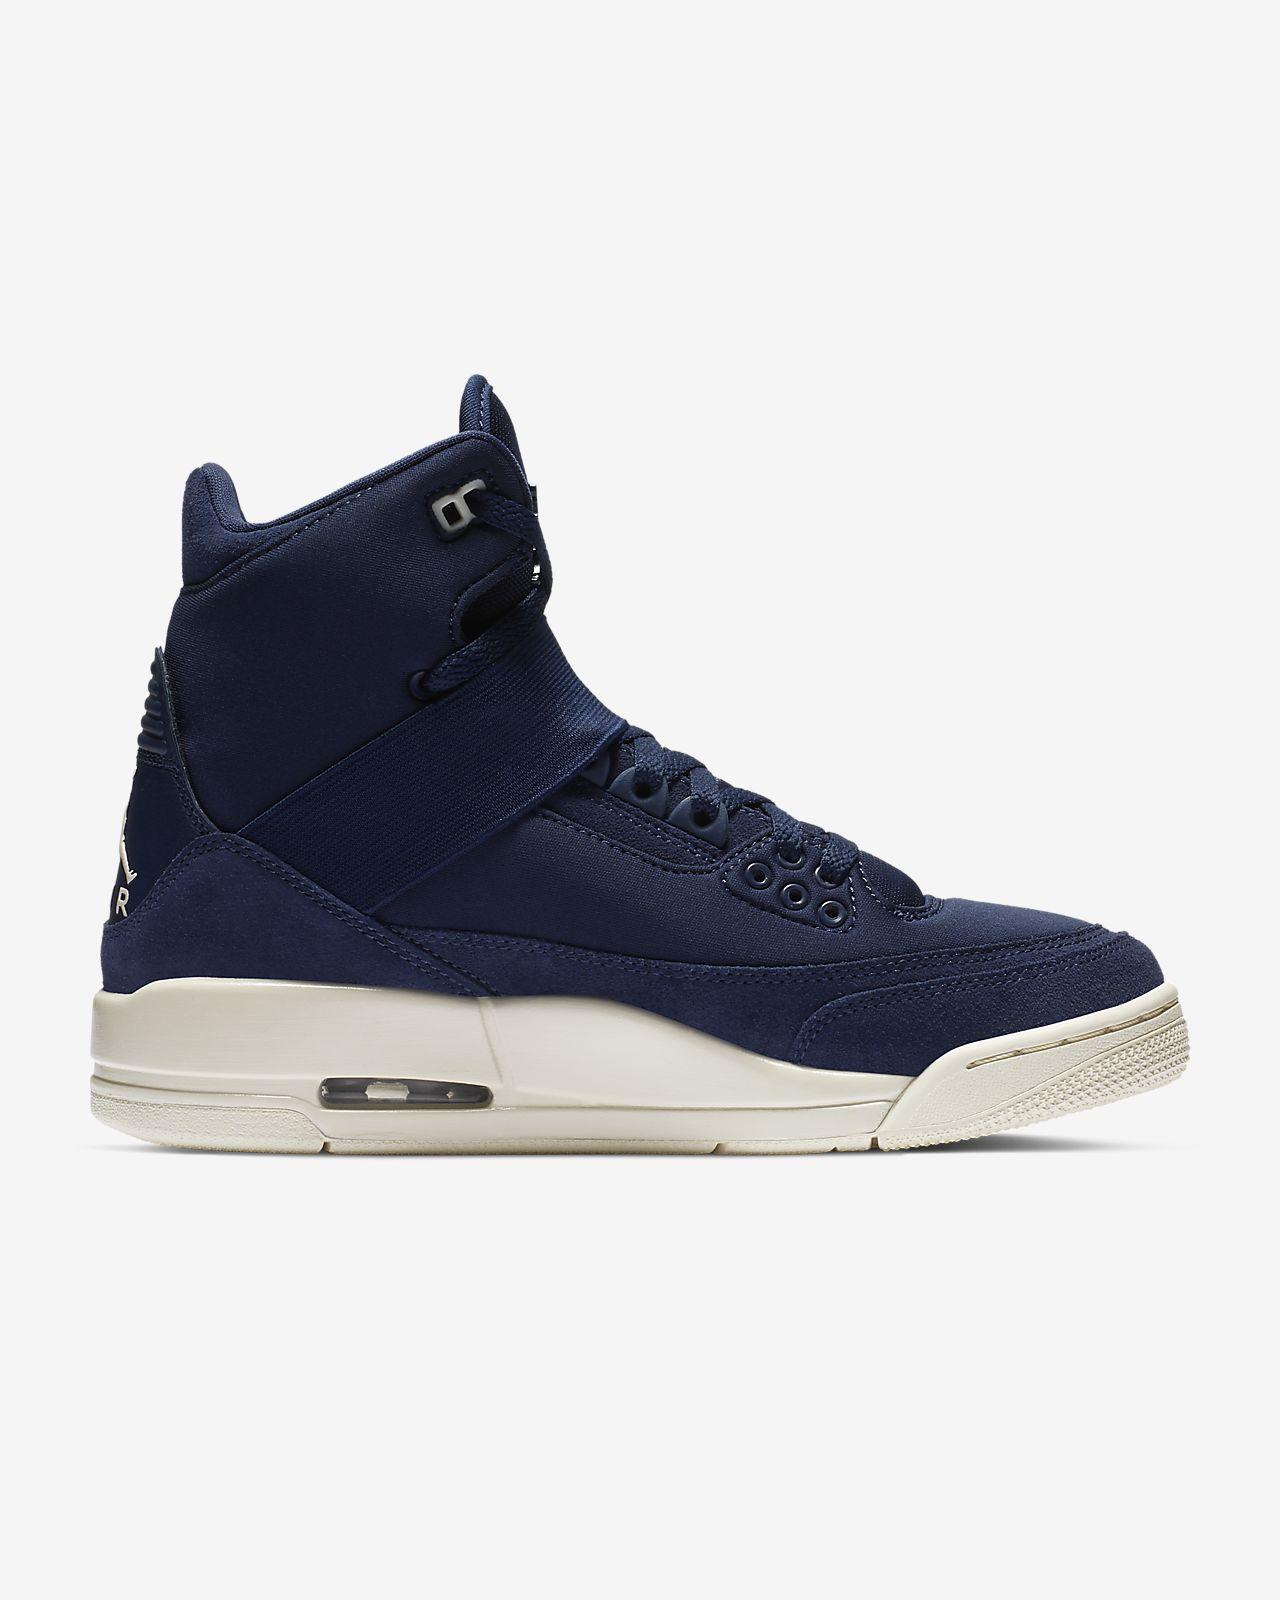 low priced 7aec9 dc2c6 Air Jordan 3 Retro Explorer XX-sko til kvinder. Nike.com DK